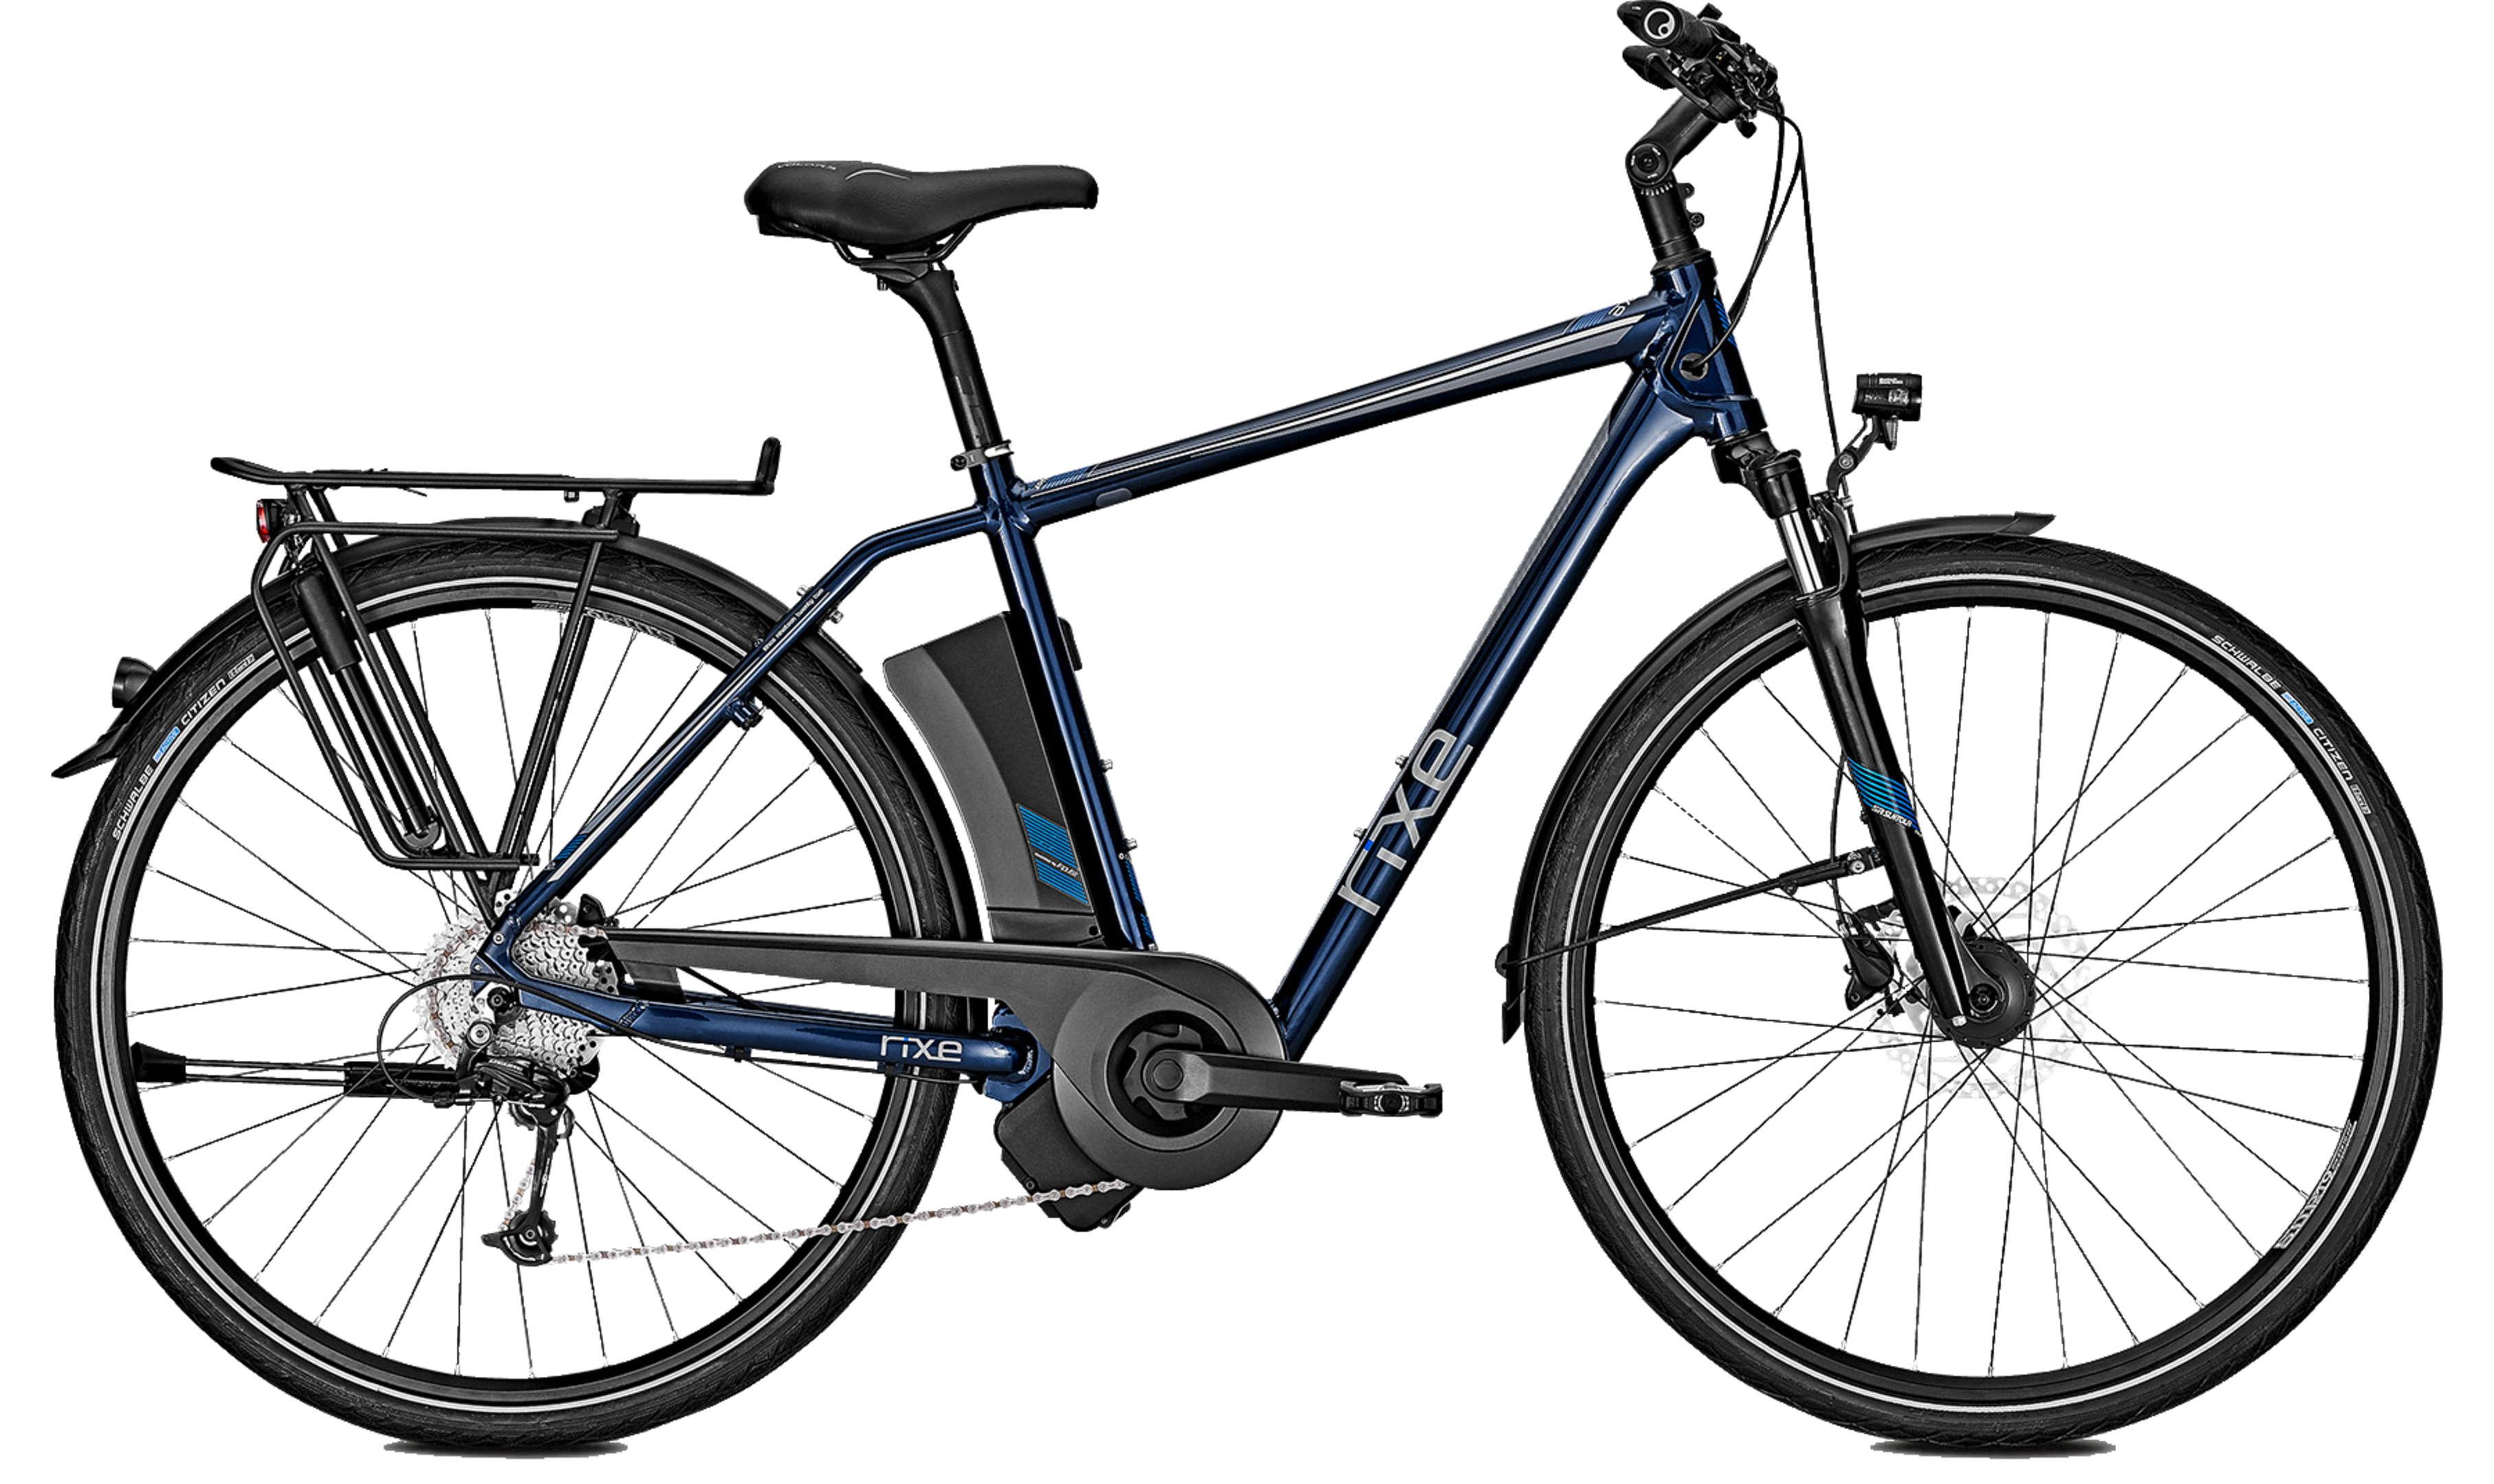 rixe e bike montpellier i9 deore 11 0ah 36 eurorad bikeleasingeurorad bikeleasing. Black Bedroom Furniture Sets. Home Design Ideas